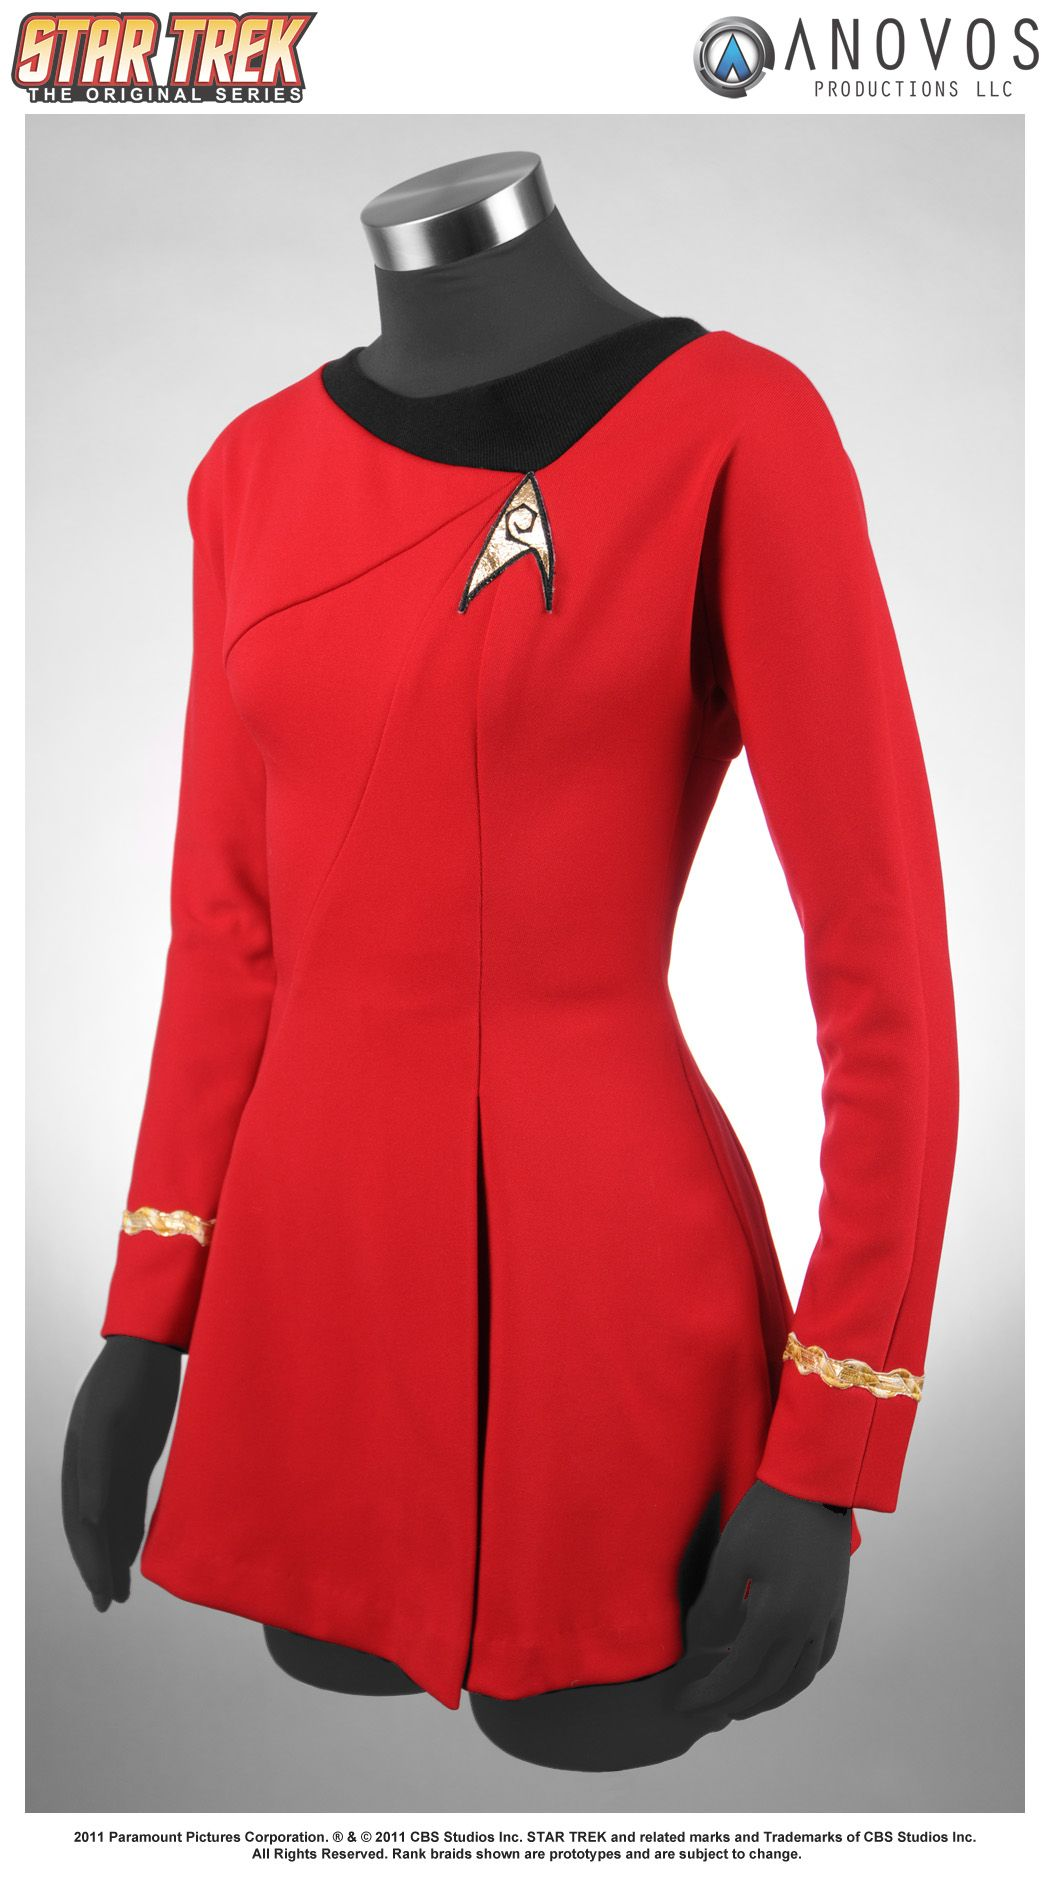 Uhura S Uniform The Real Thing Star Trek Cosplay Female Star Trek Uniforms Uhura Costume